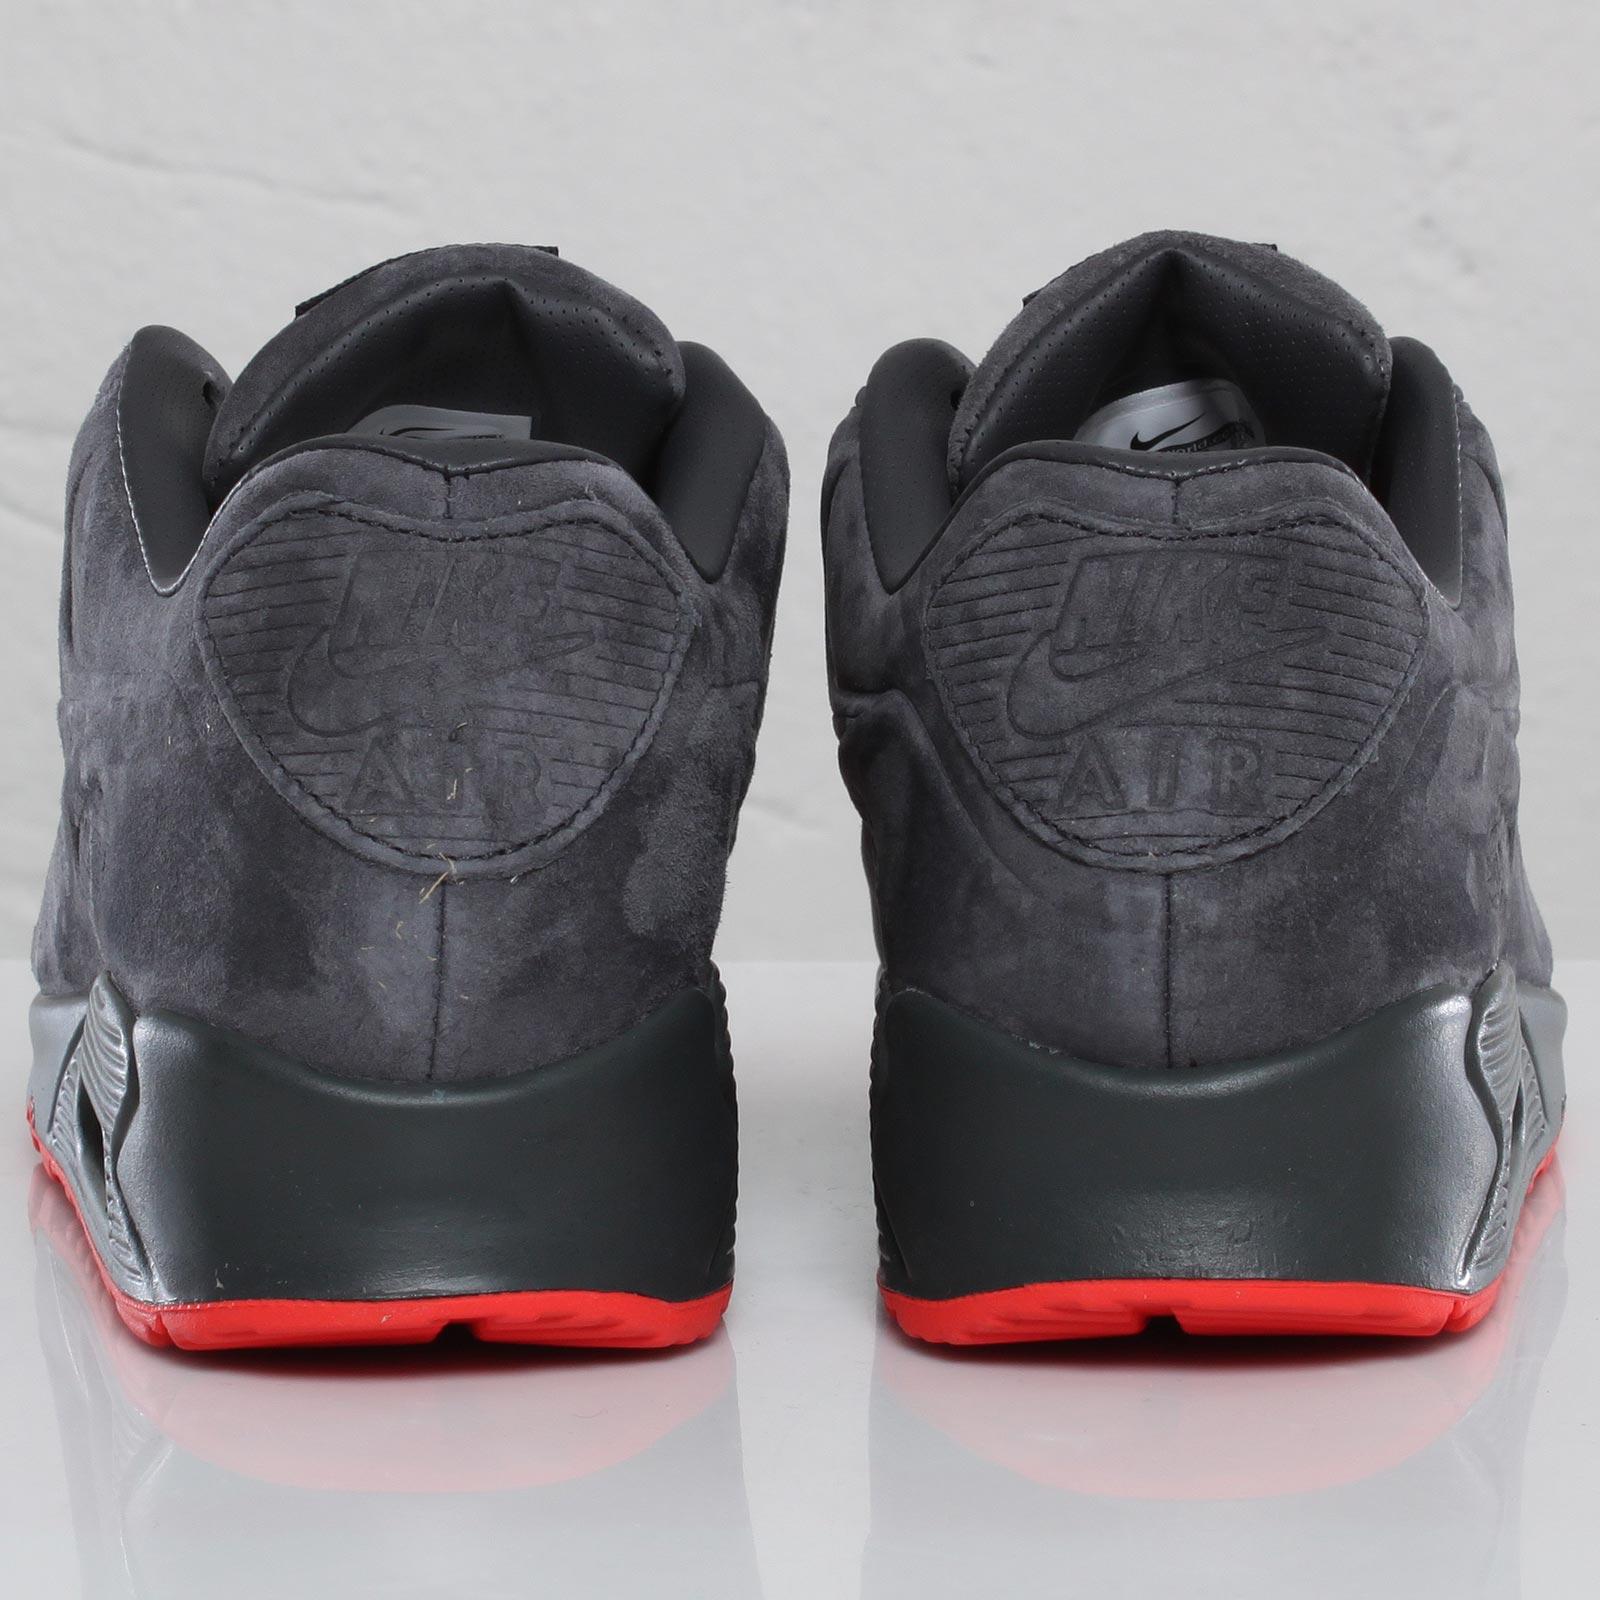 super popular b6326 f2f4a Nike Air Max 90 VT - 102807 - Sneakersnstuff   sneakers   streetwear online  since 1999